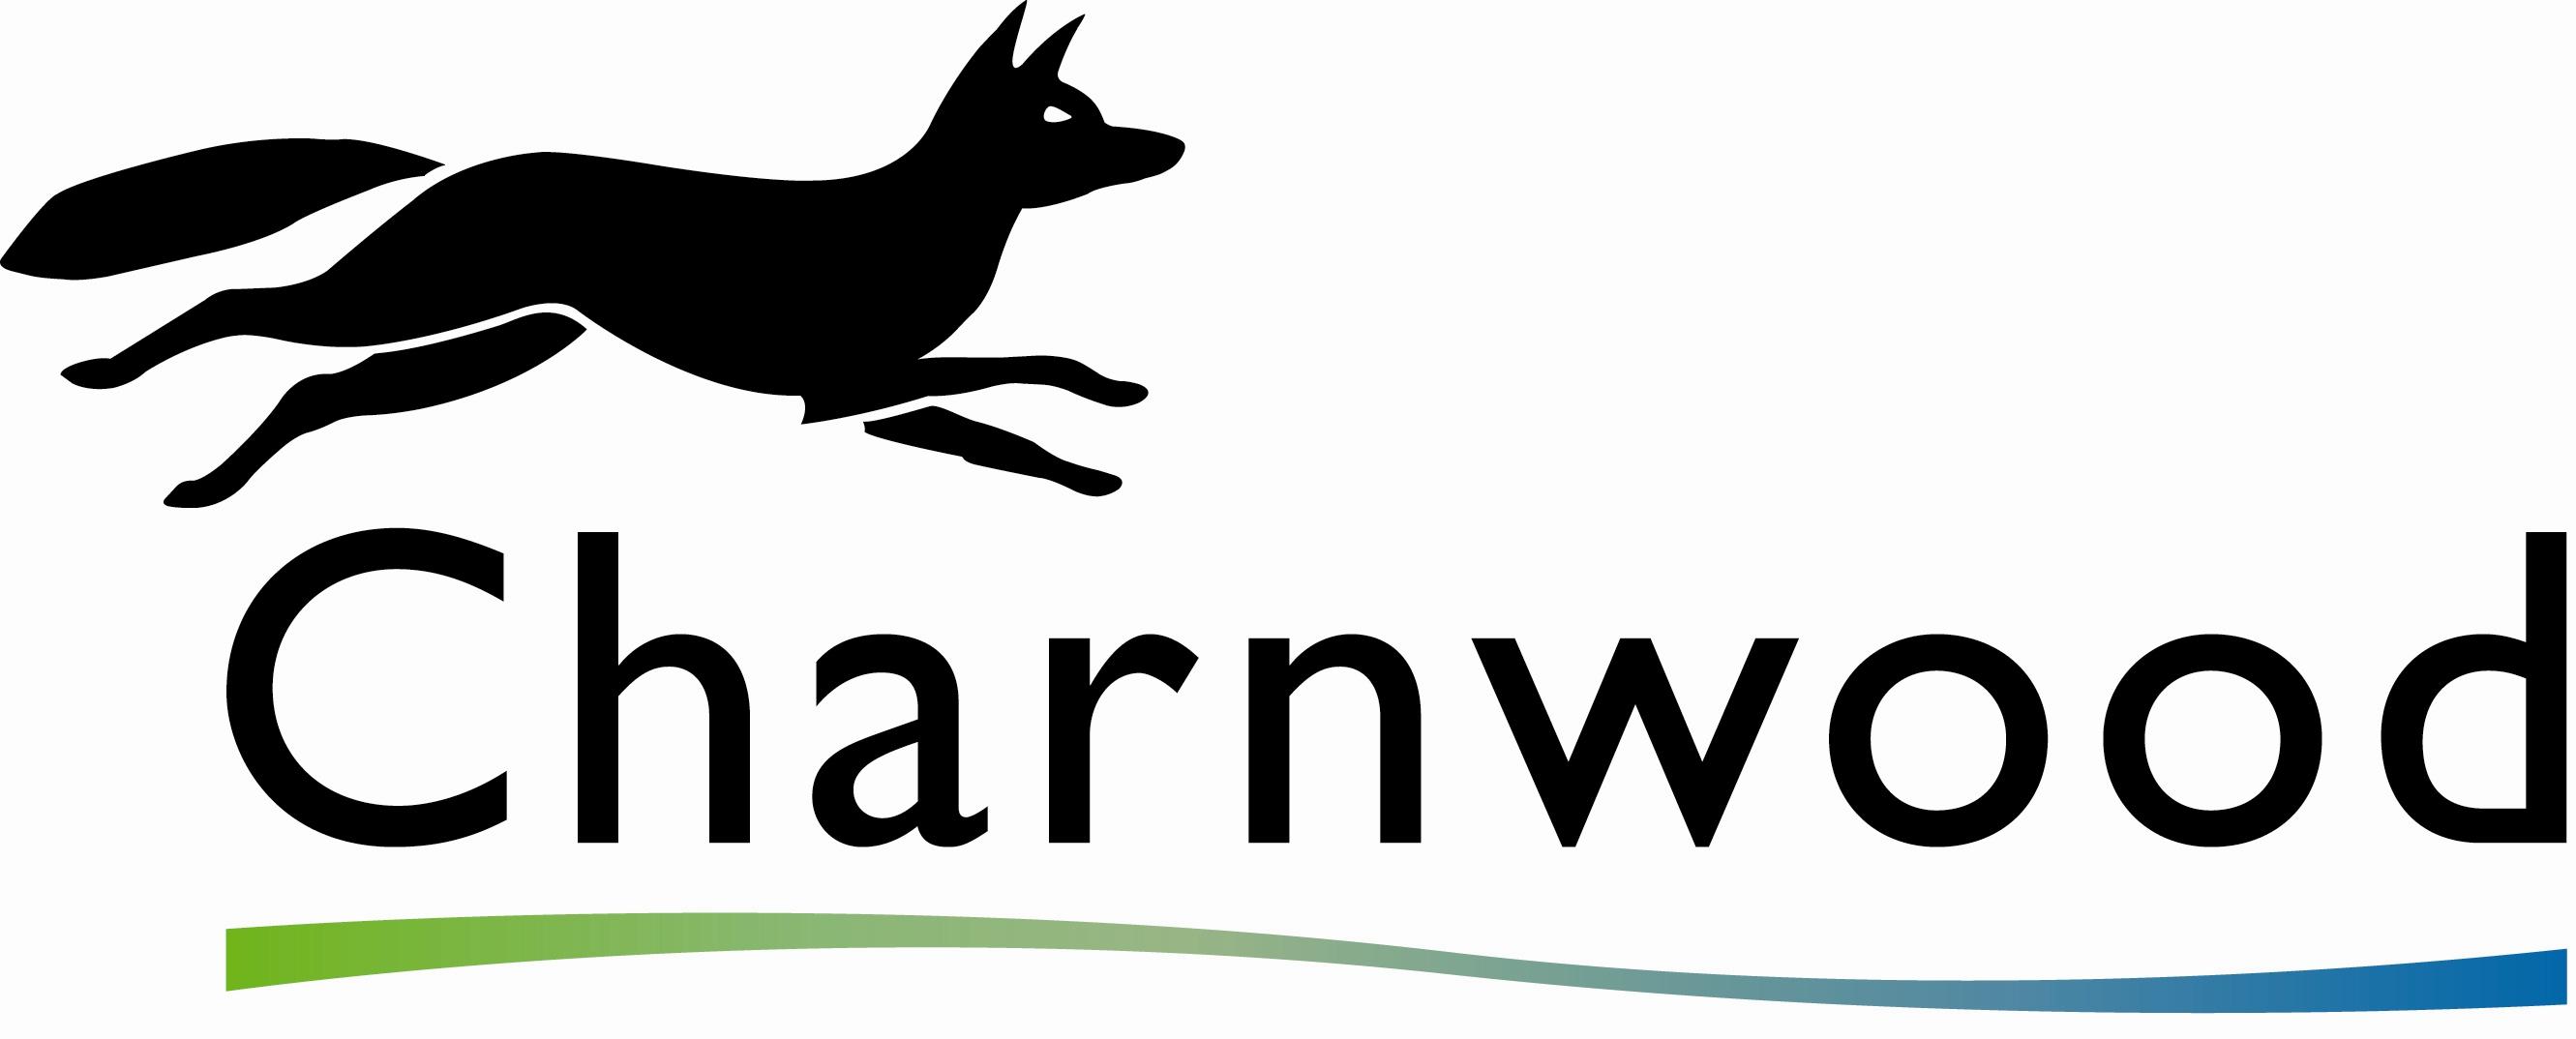 Charnwood Borough Council